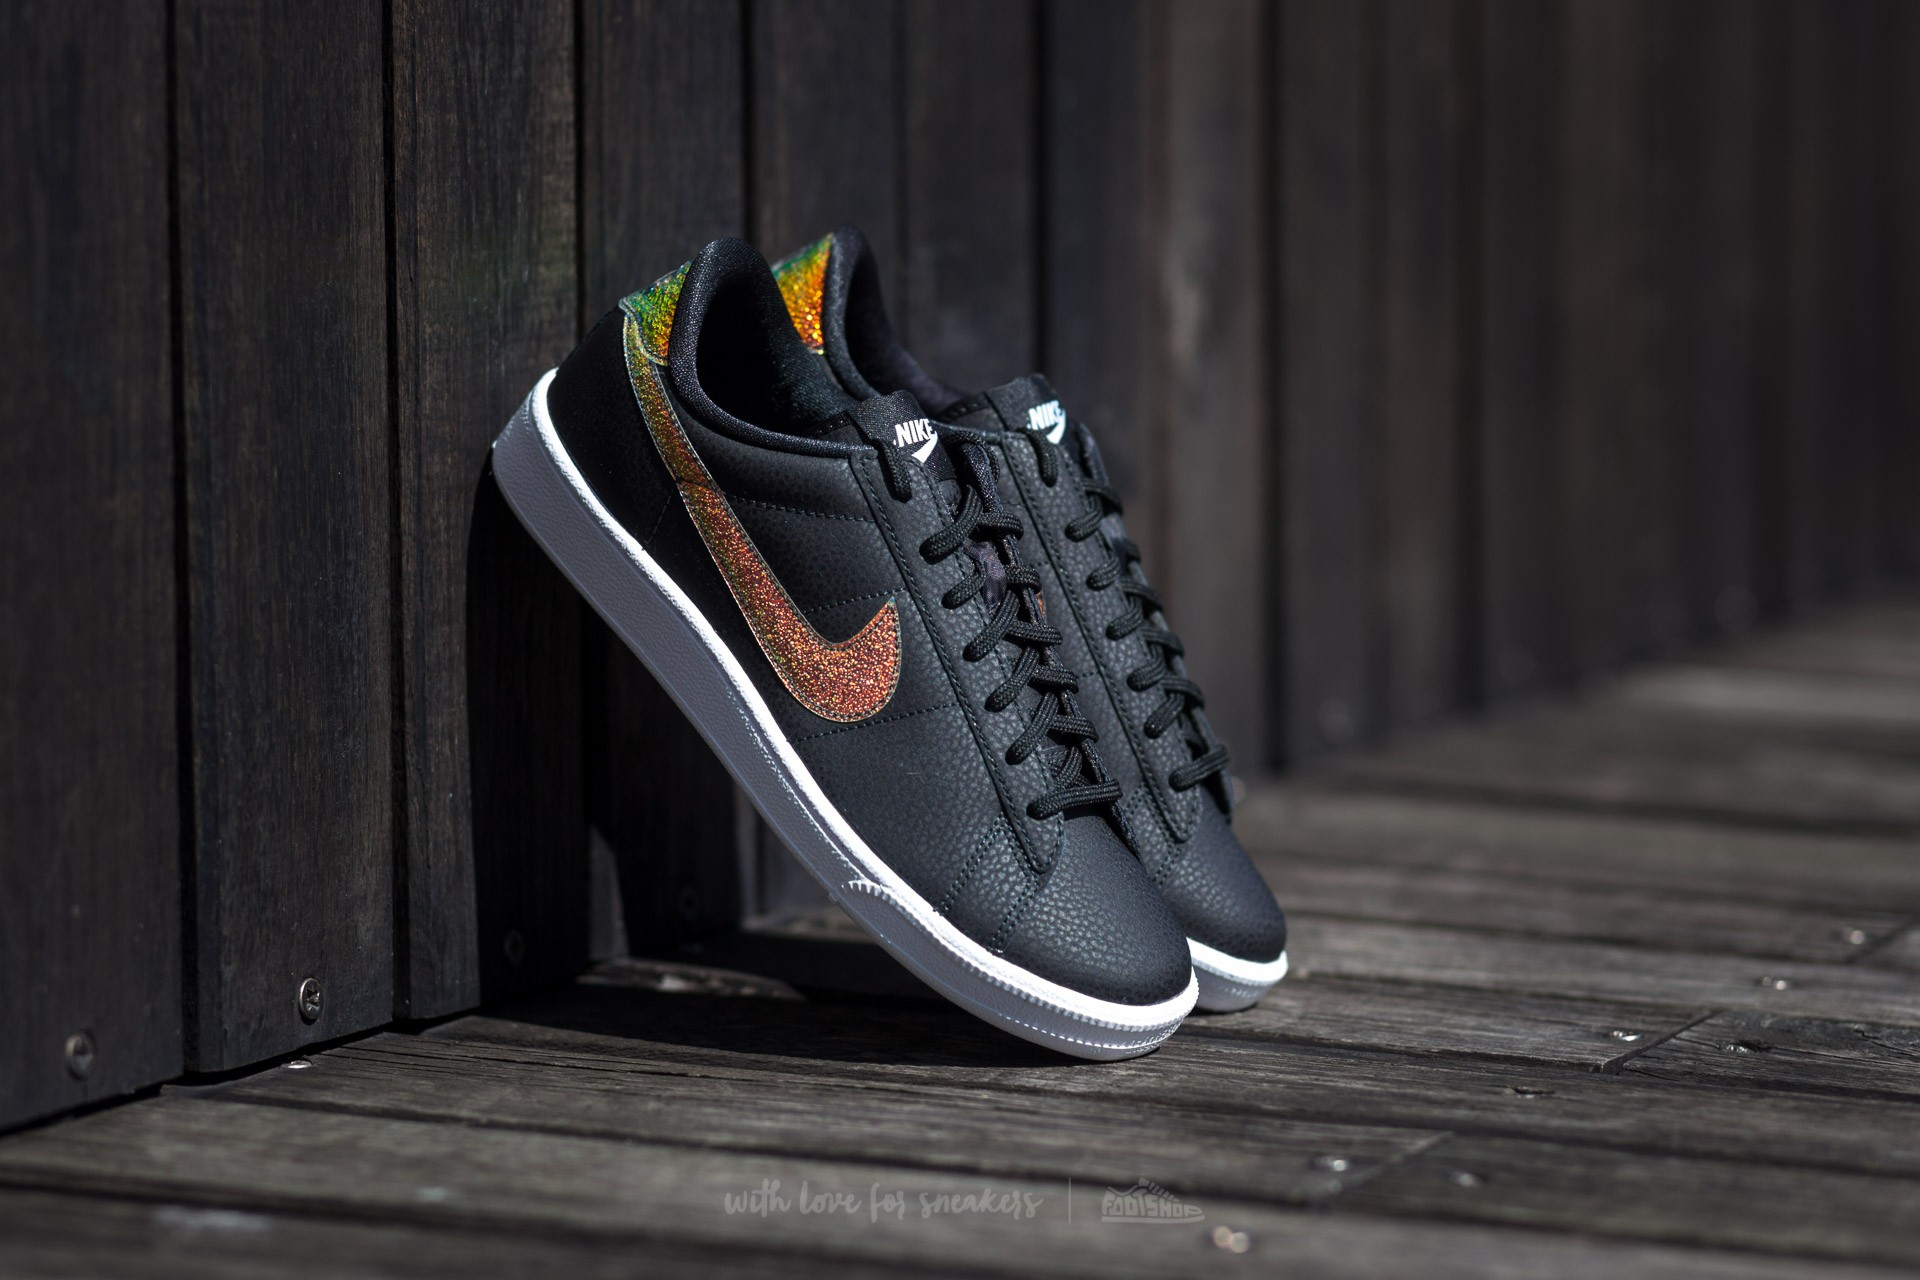 Nike Wmns Tennis Classic Premium Black/ Black-White